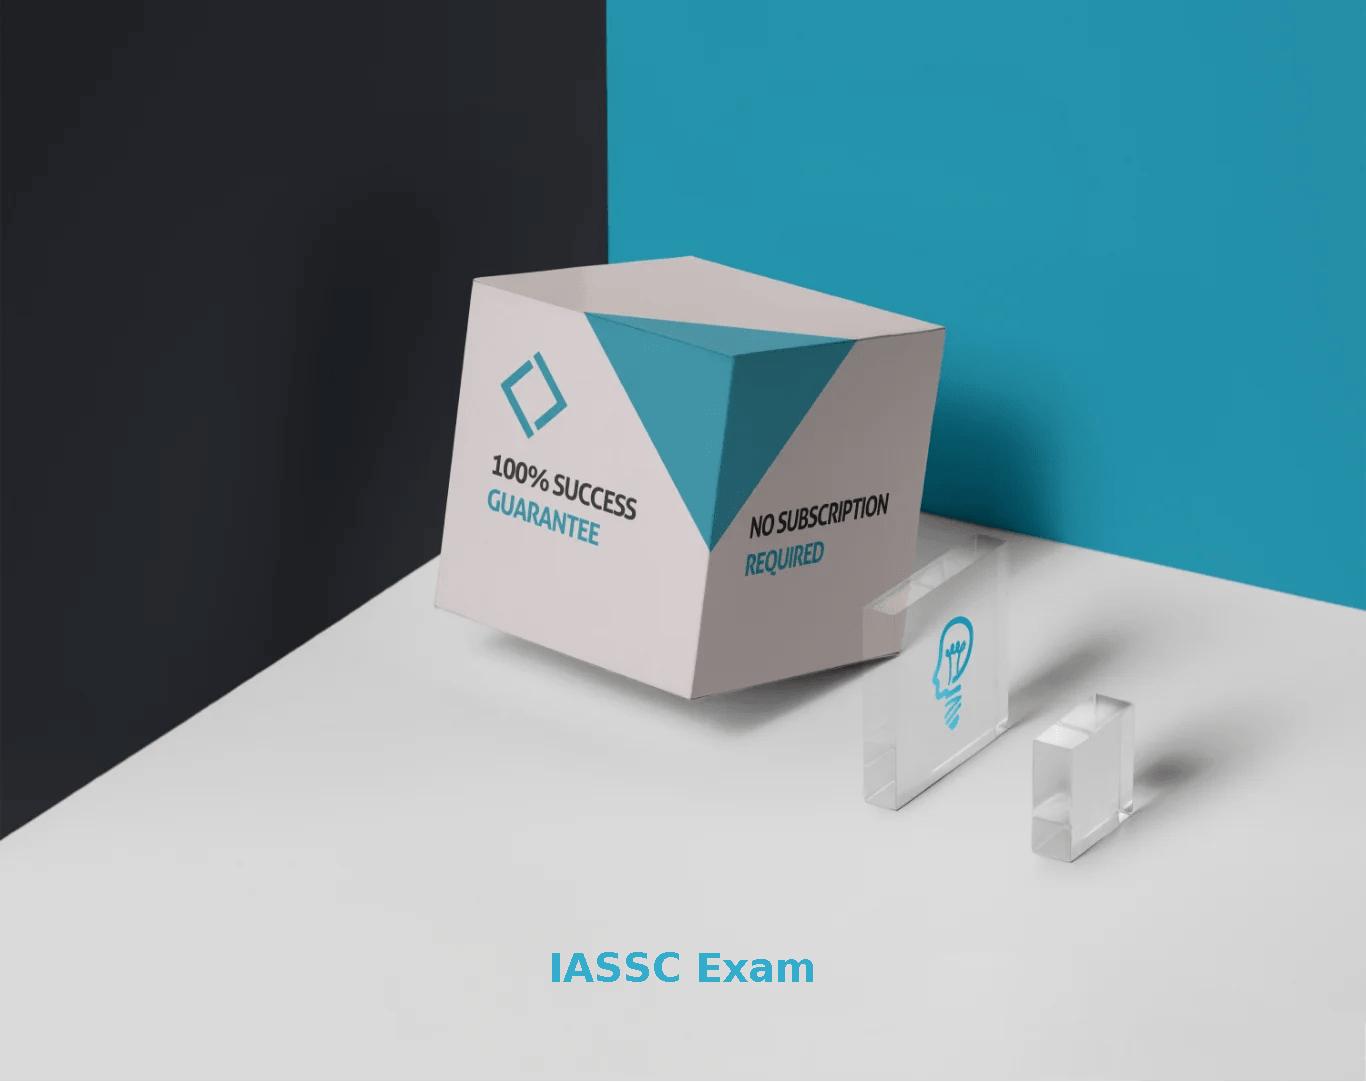 IASSC Exam Dumps